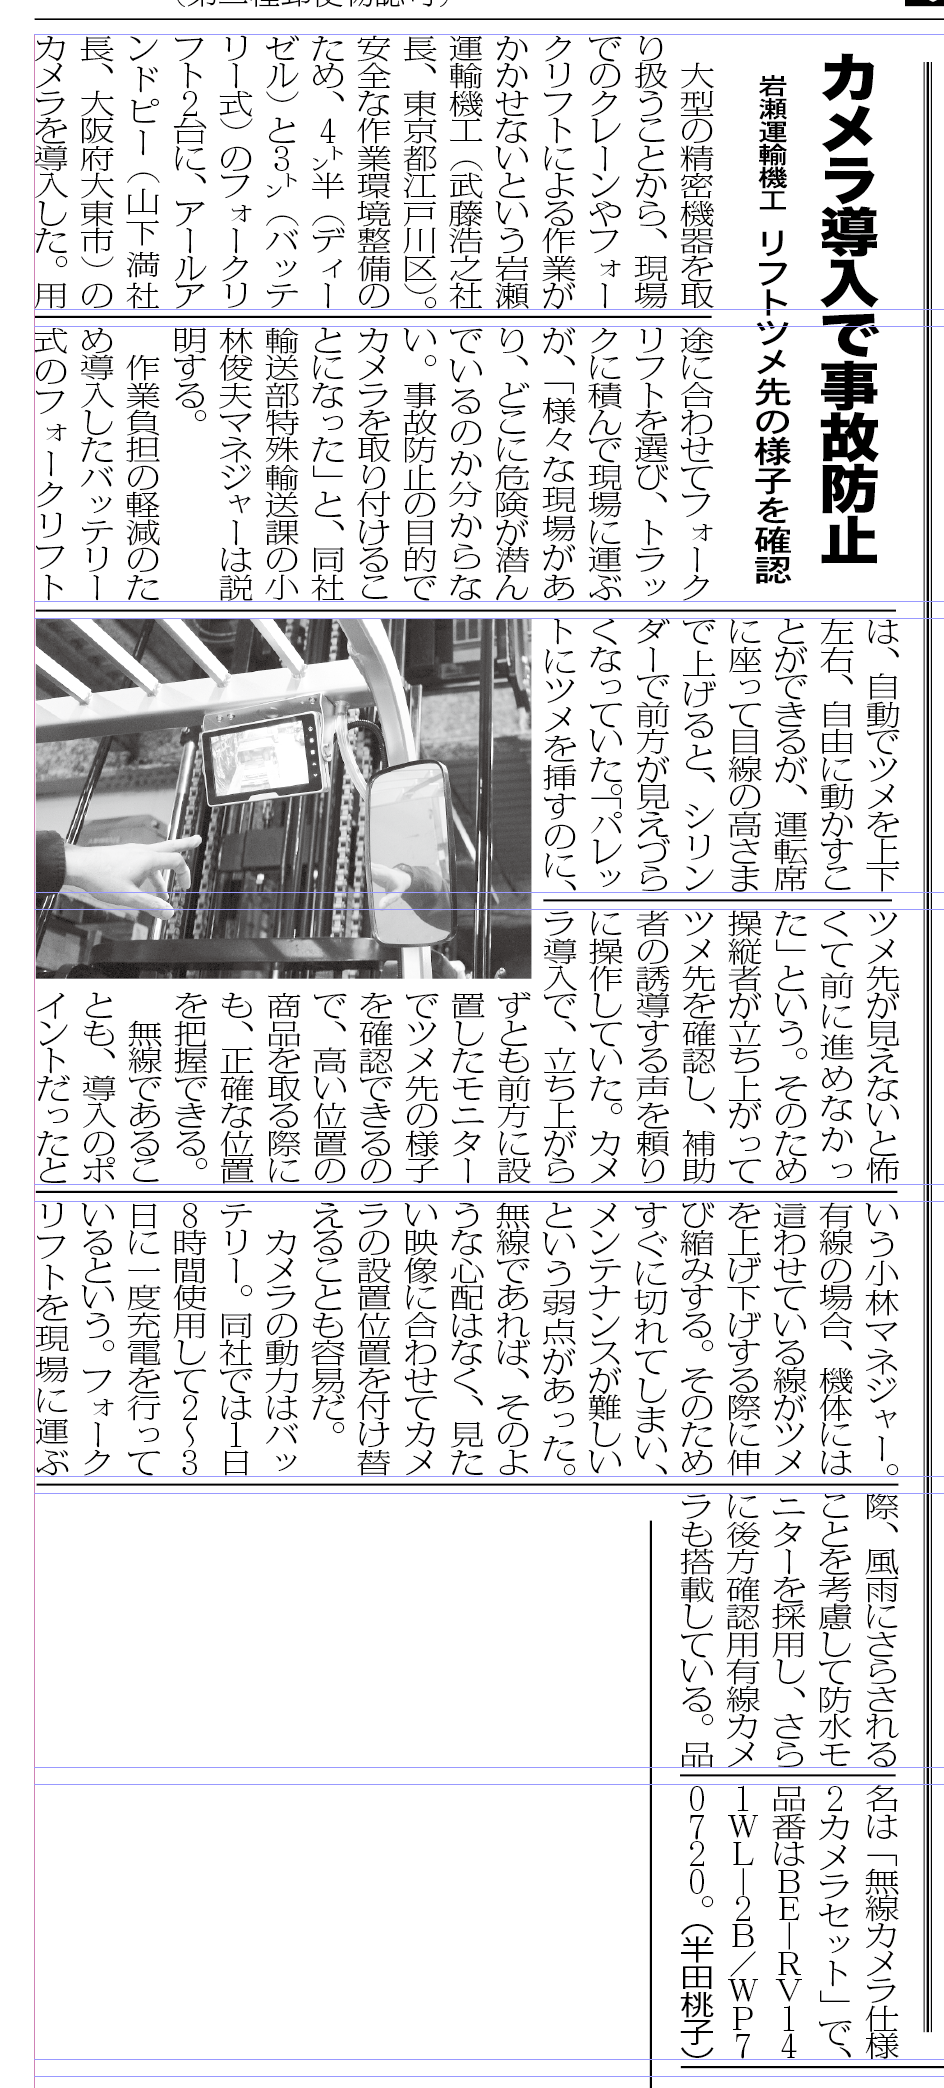 http://www.r-p-jp.com/work/c-work/86.html